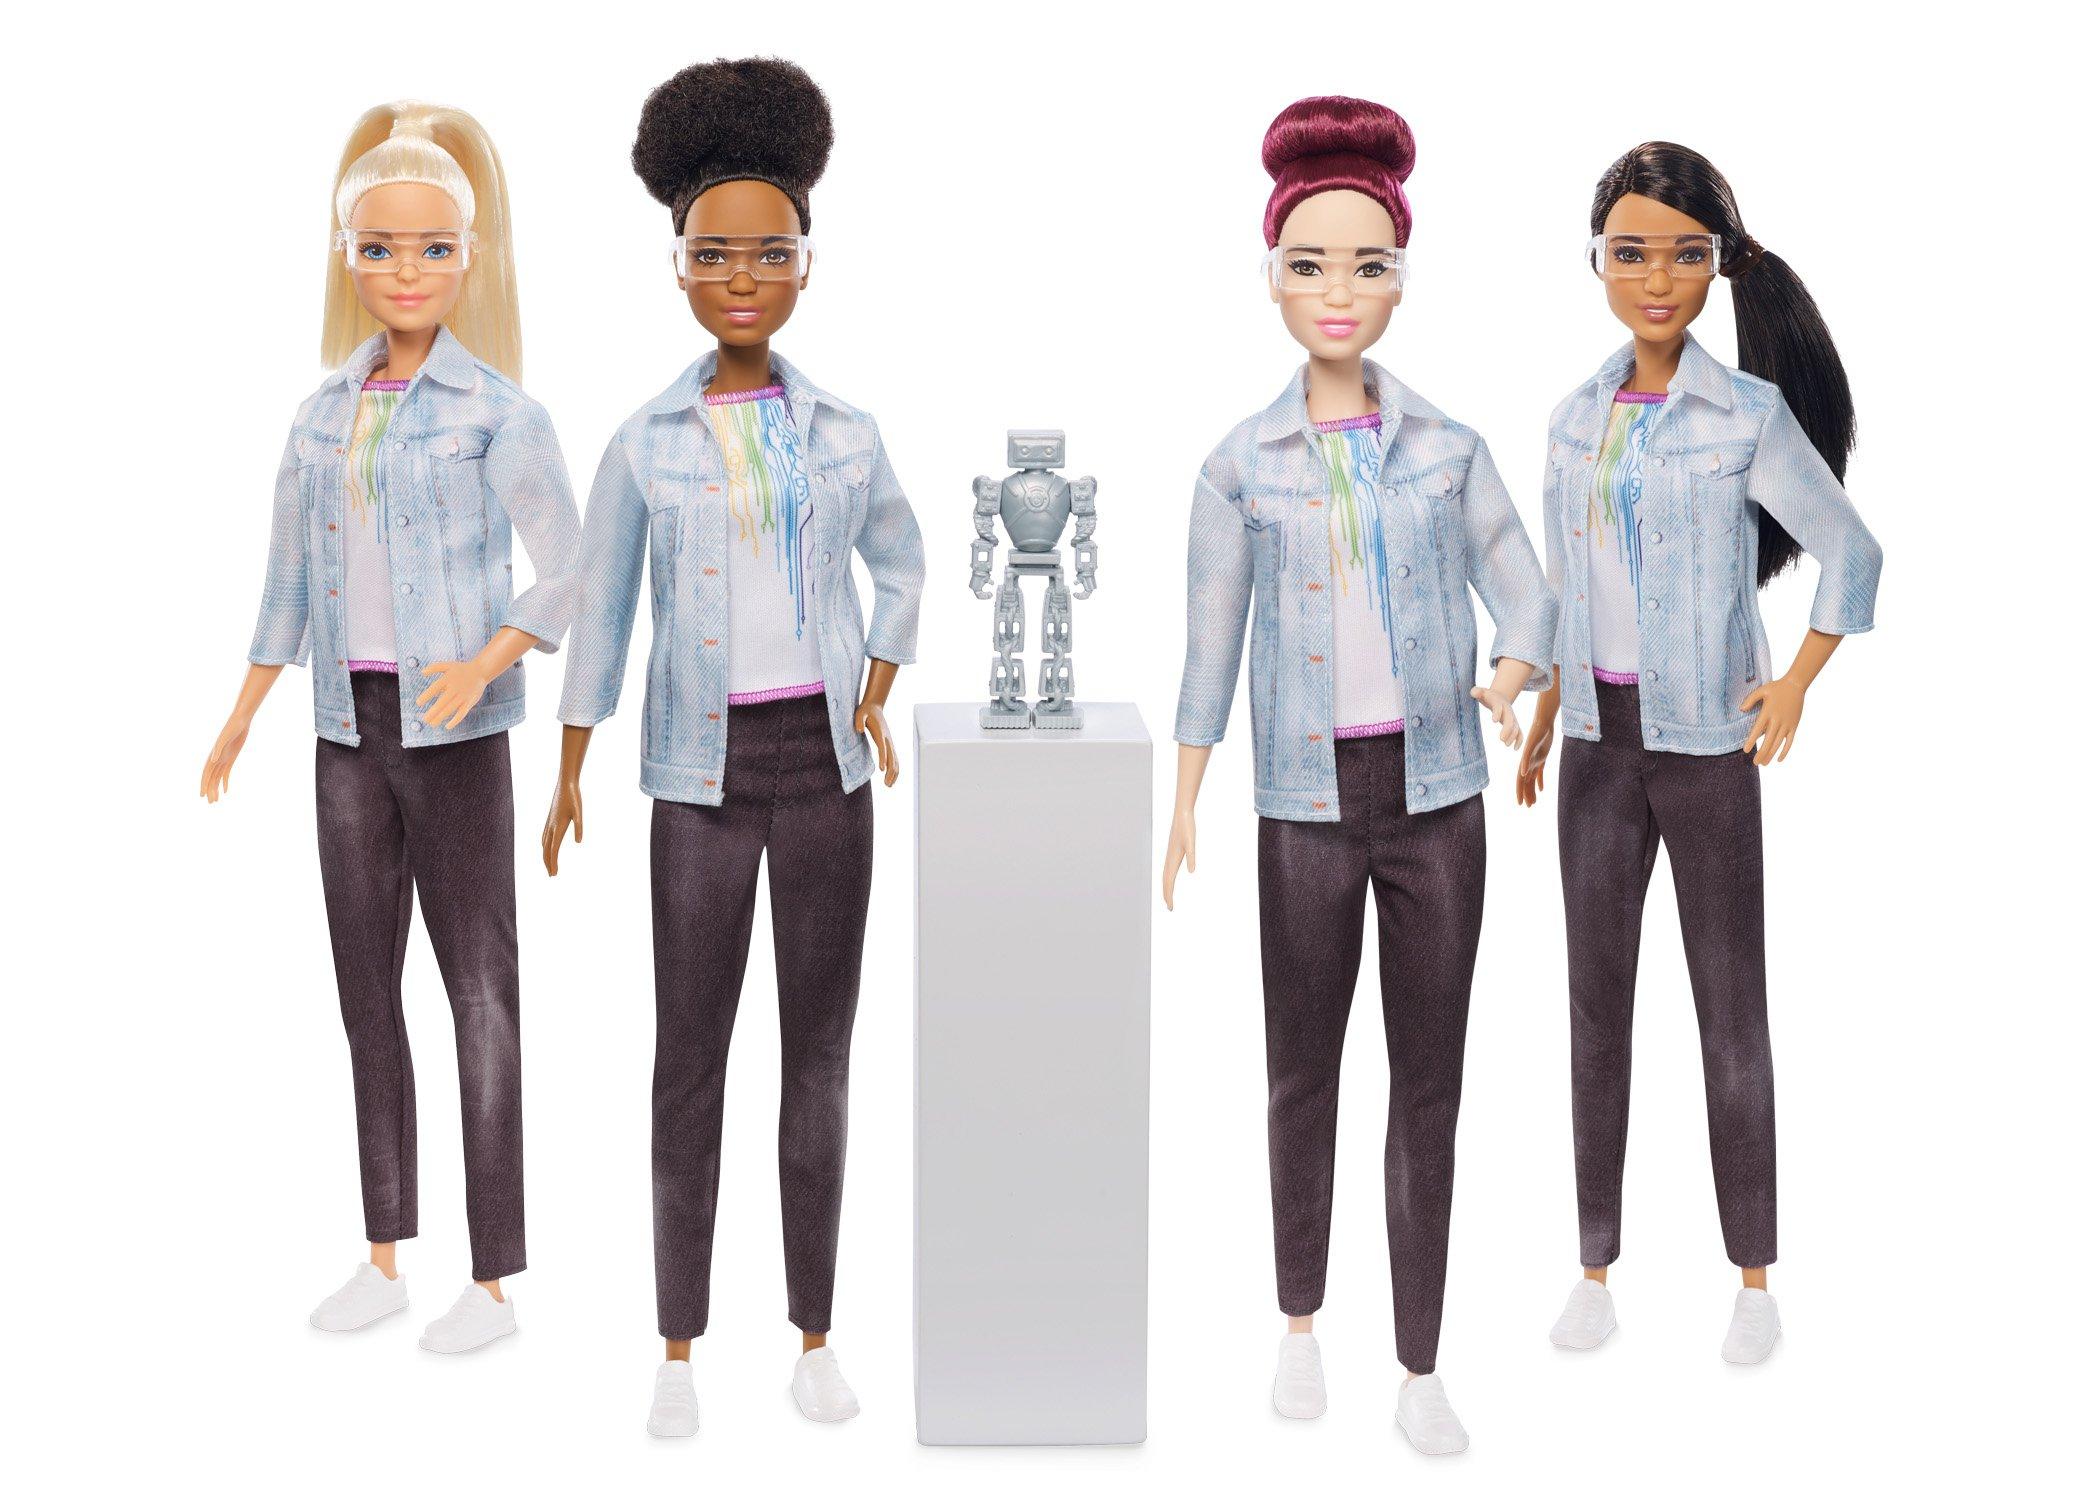 Mattel launches a robotics engineer Barbie